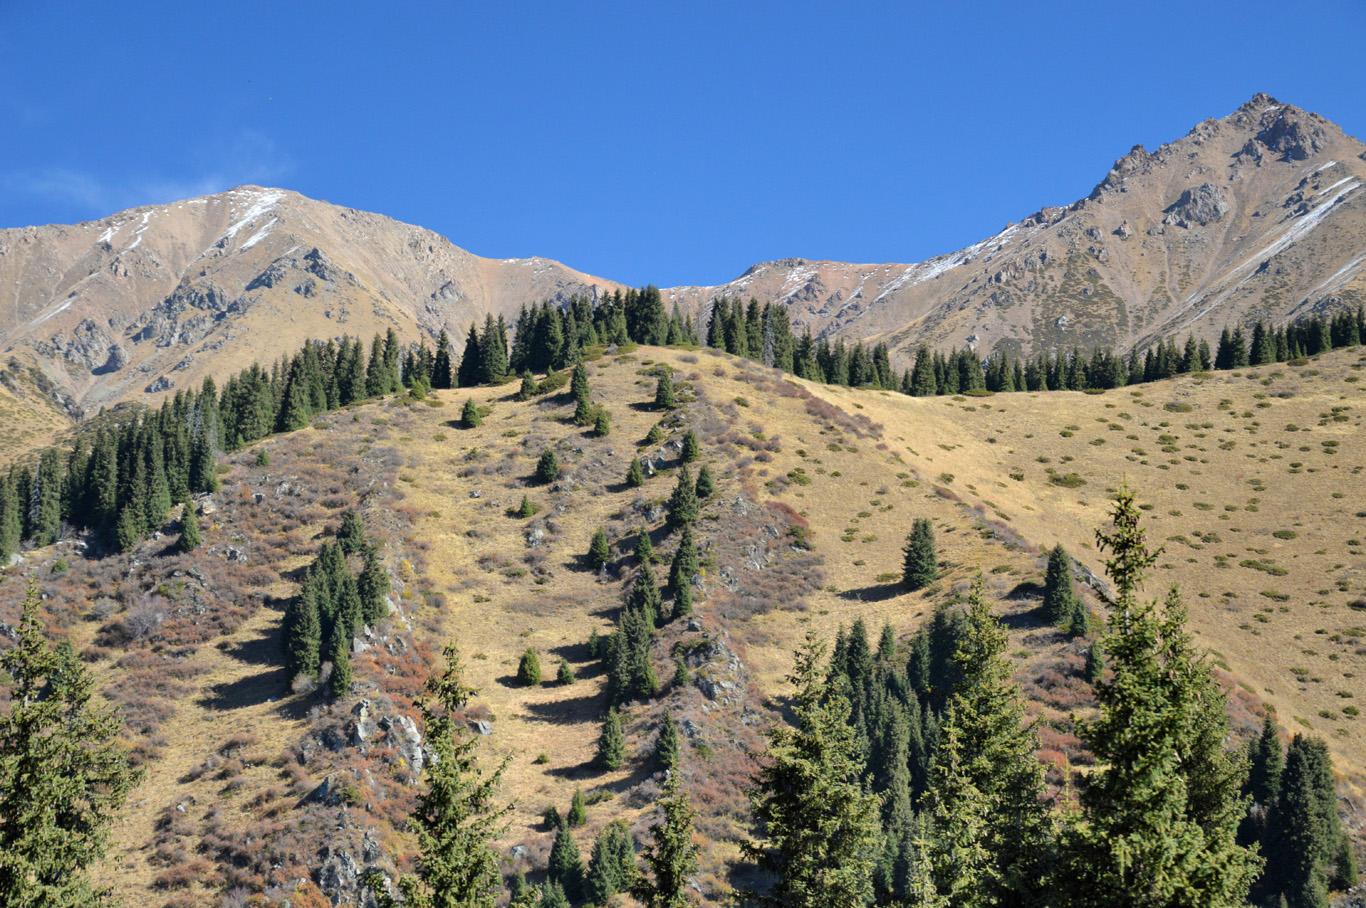 Steep mountains near Almaty